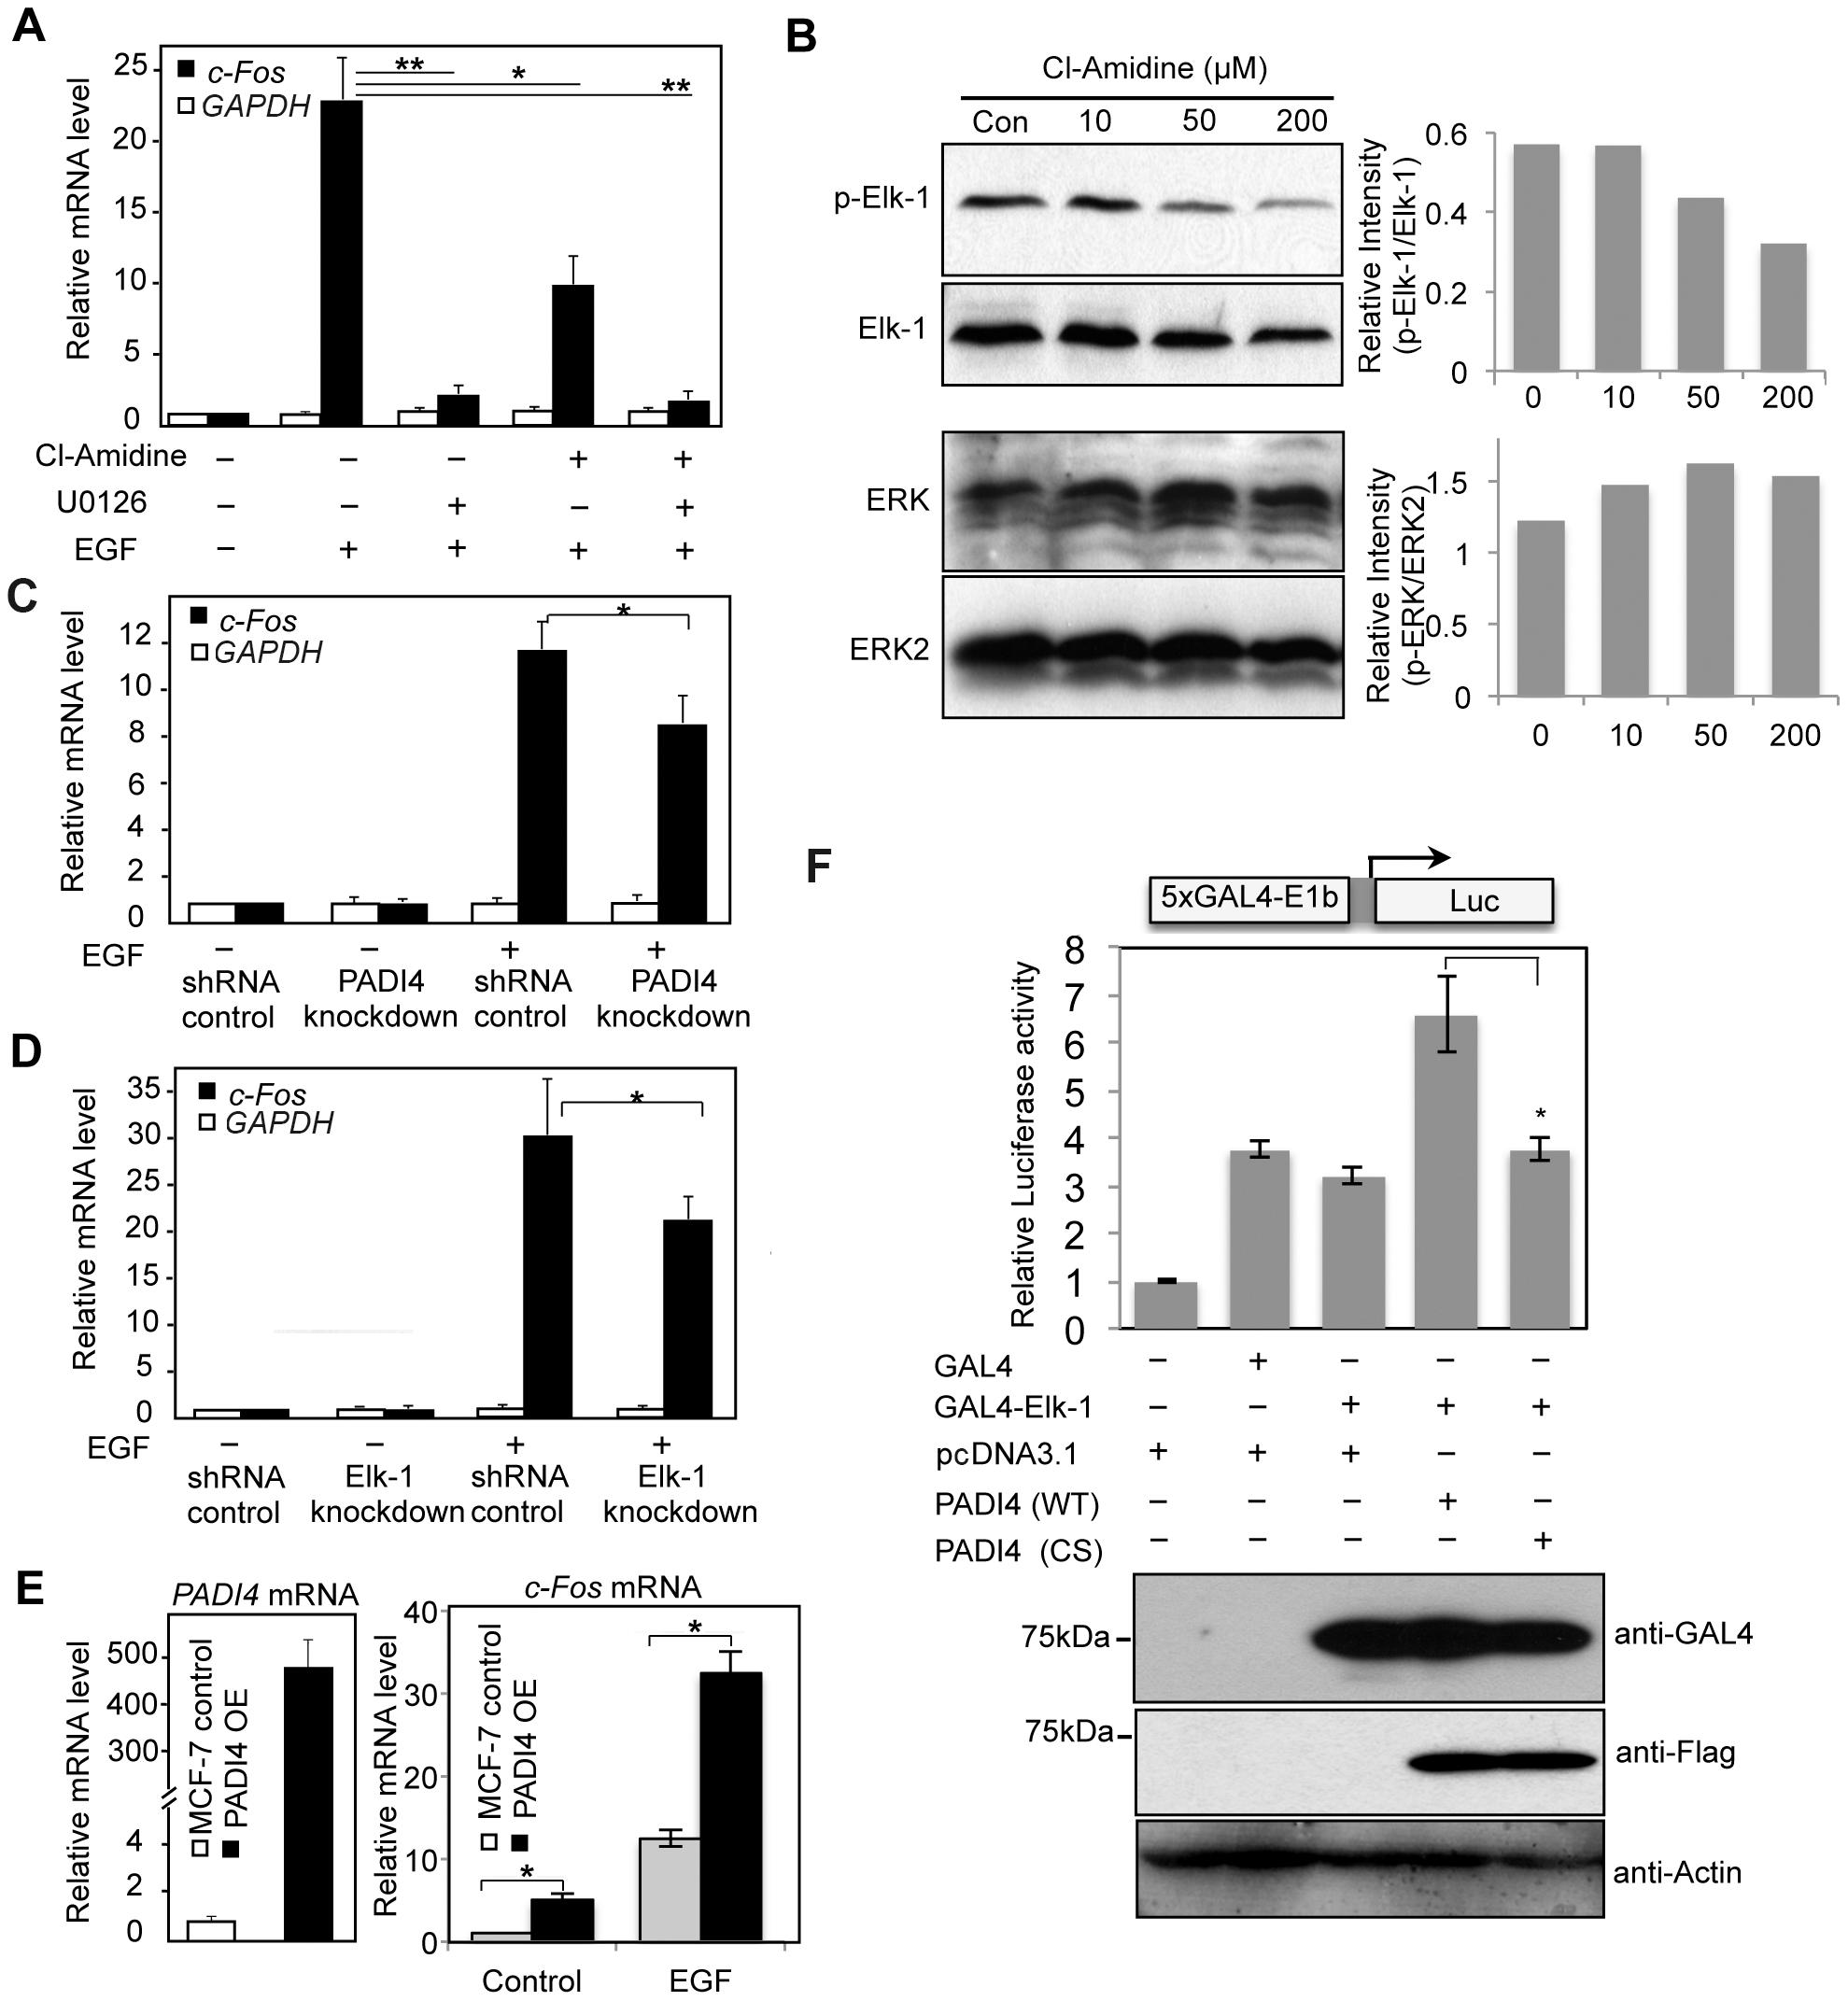 PADI4 mediates expression of the Elk-1 target gene <i>c-Fos</i>.